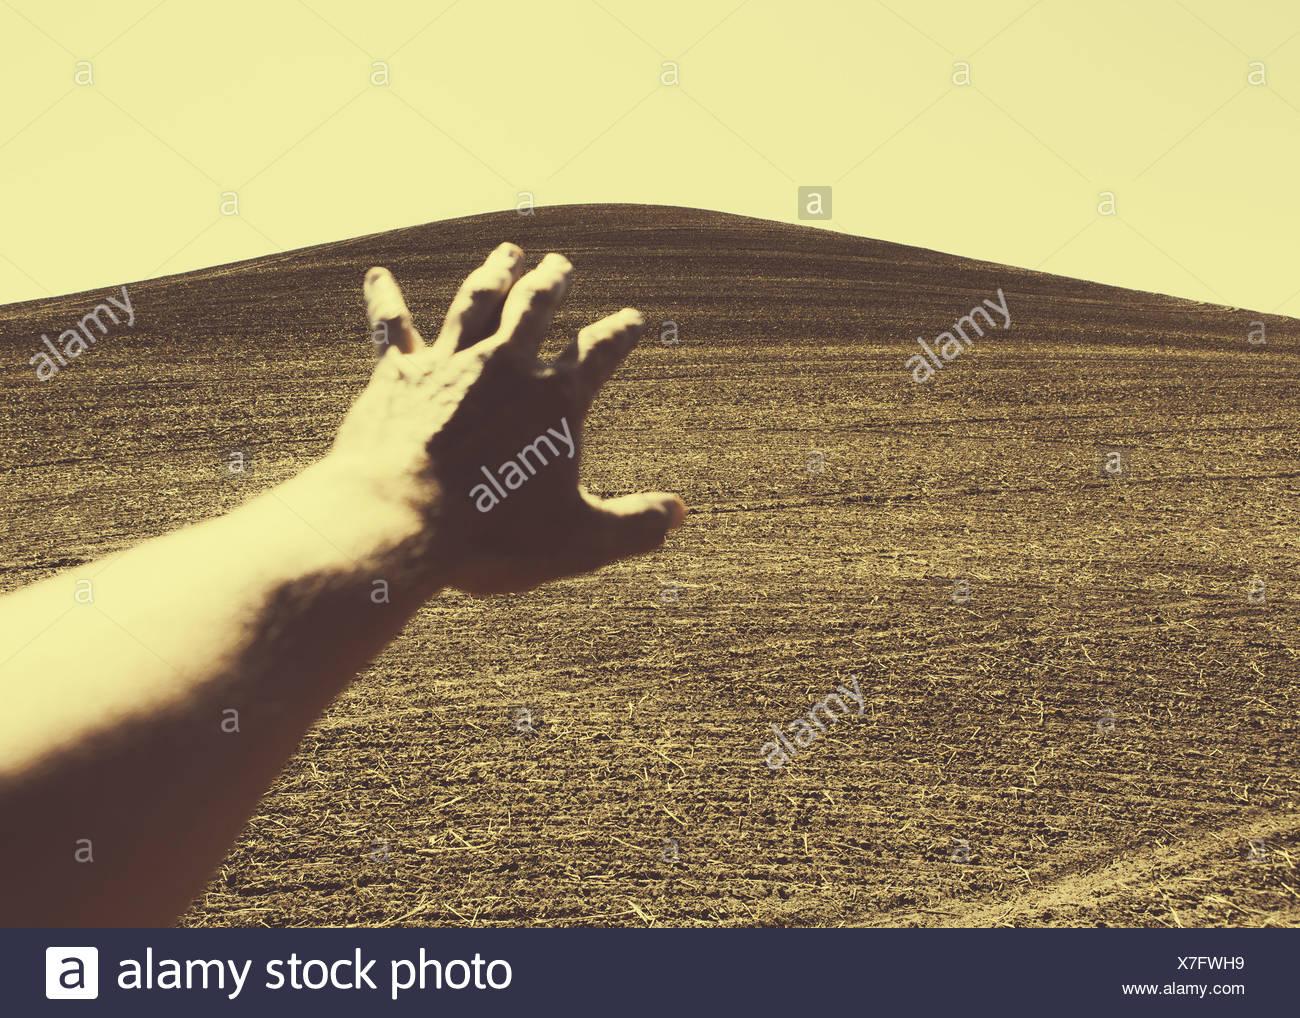 Hand extending towards ploughed farmland, near Pullman - Stock Image